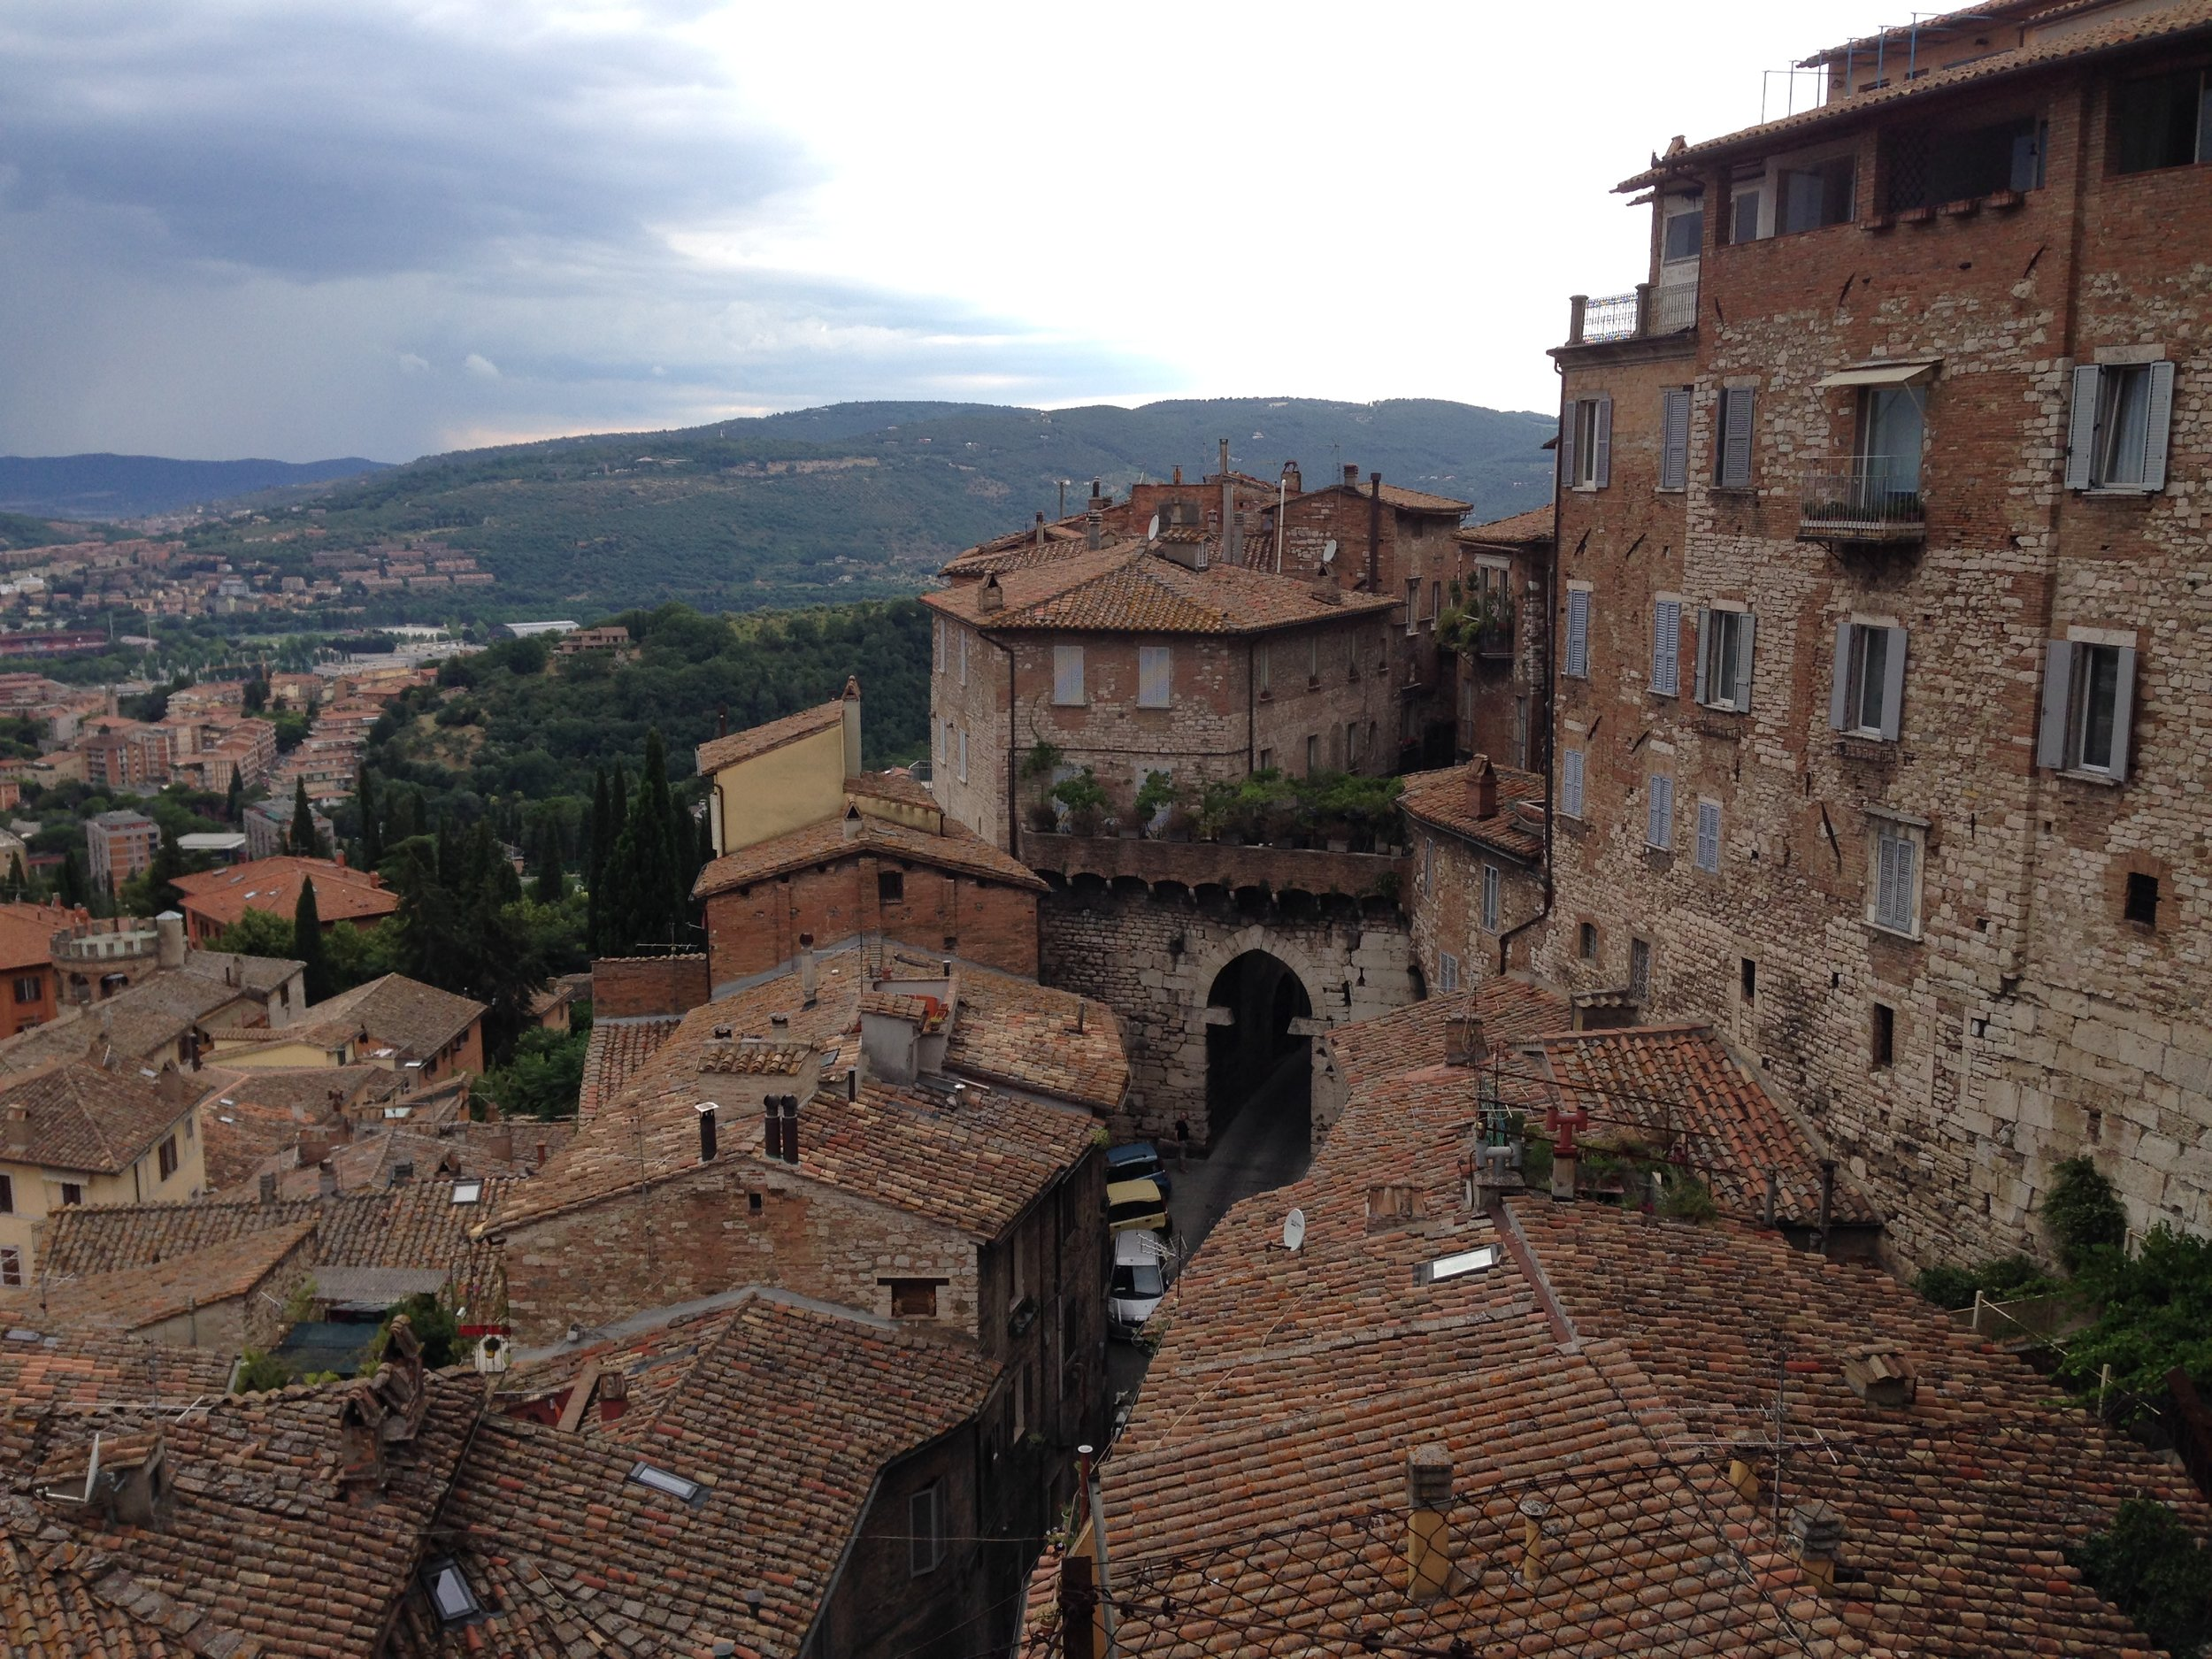 Perugia: L'arco della mandorla (mandelporten) sett frå dei gamle bymurane. Foto: Nora G. Bækkelund